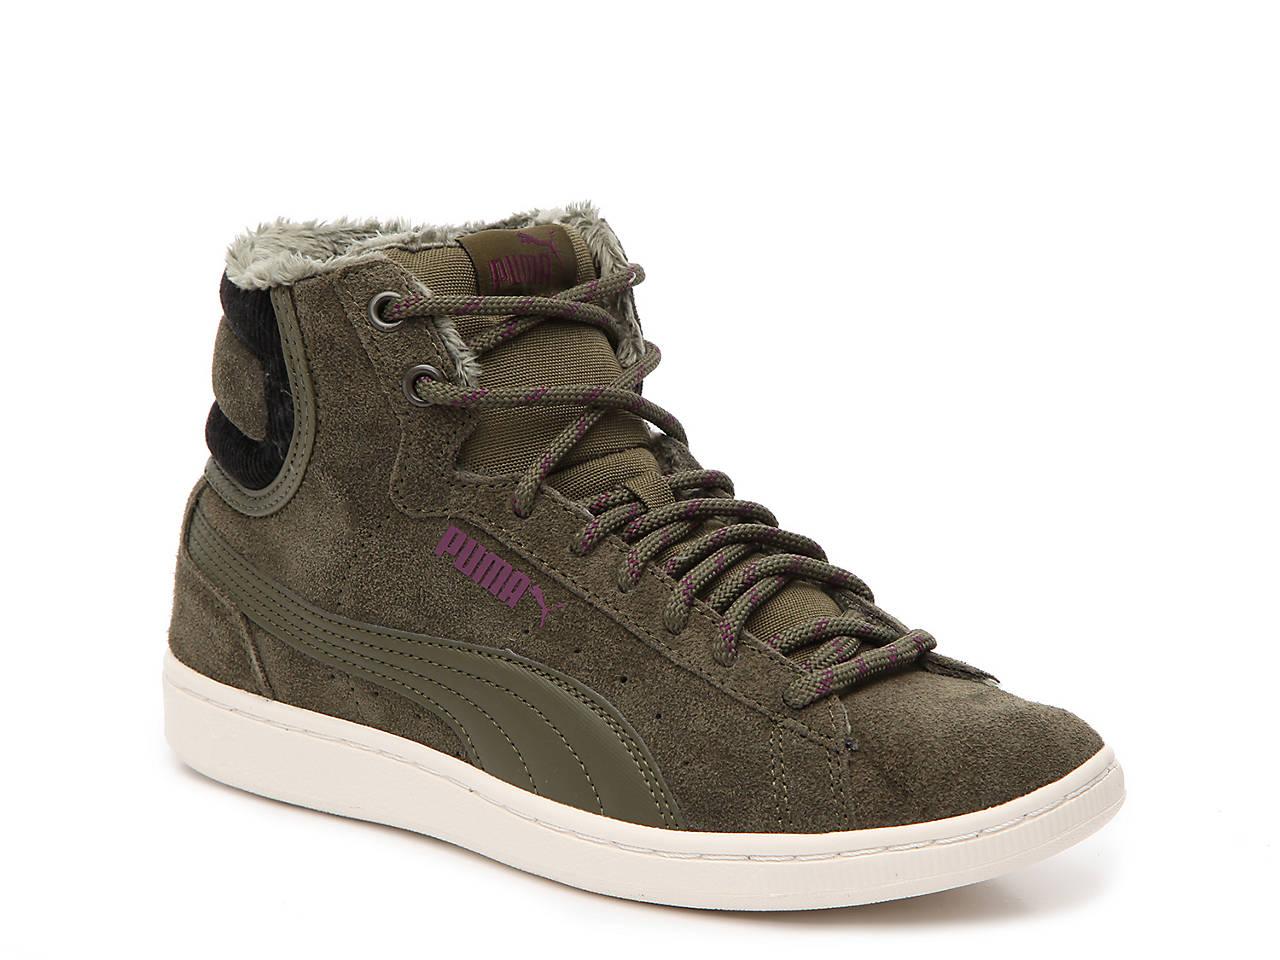 2886d465afb4c5 Puma Vikky Mid Corduroy High-Top Sneaker - Women s Women s Shoes